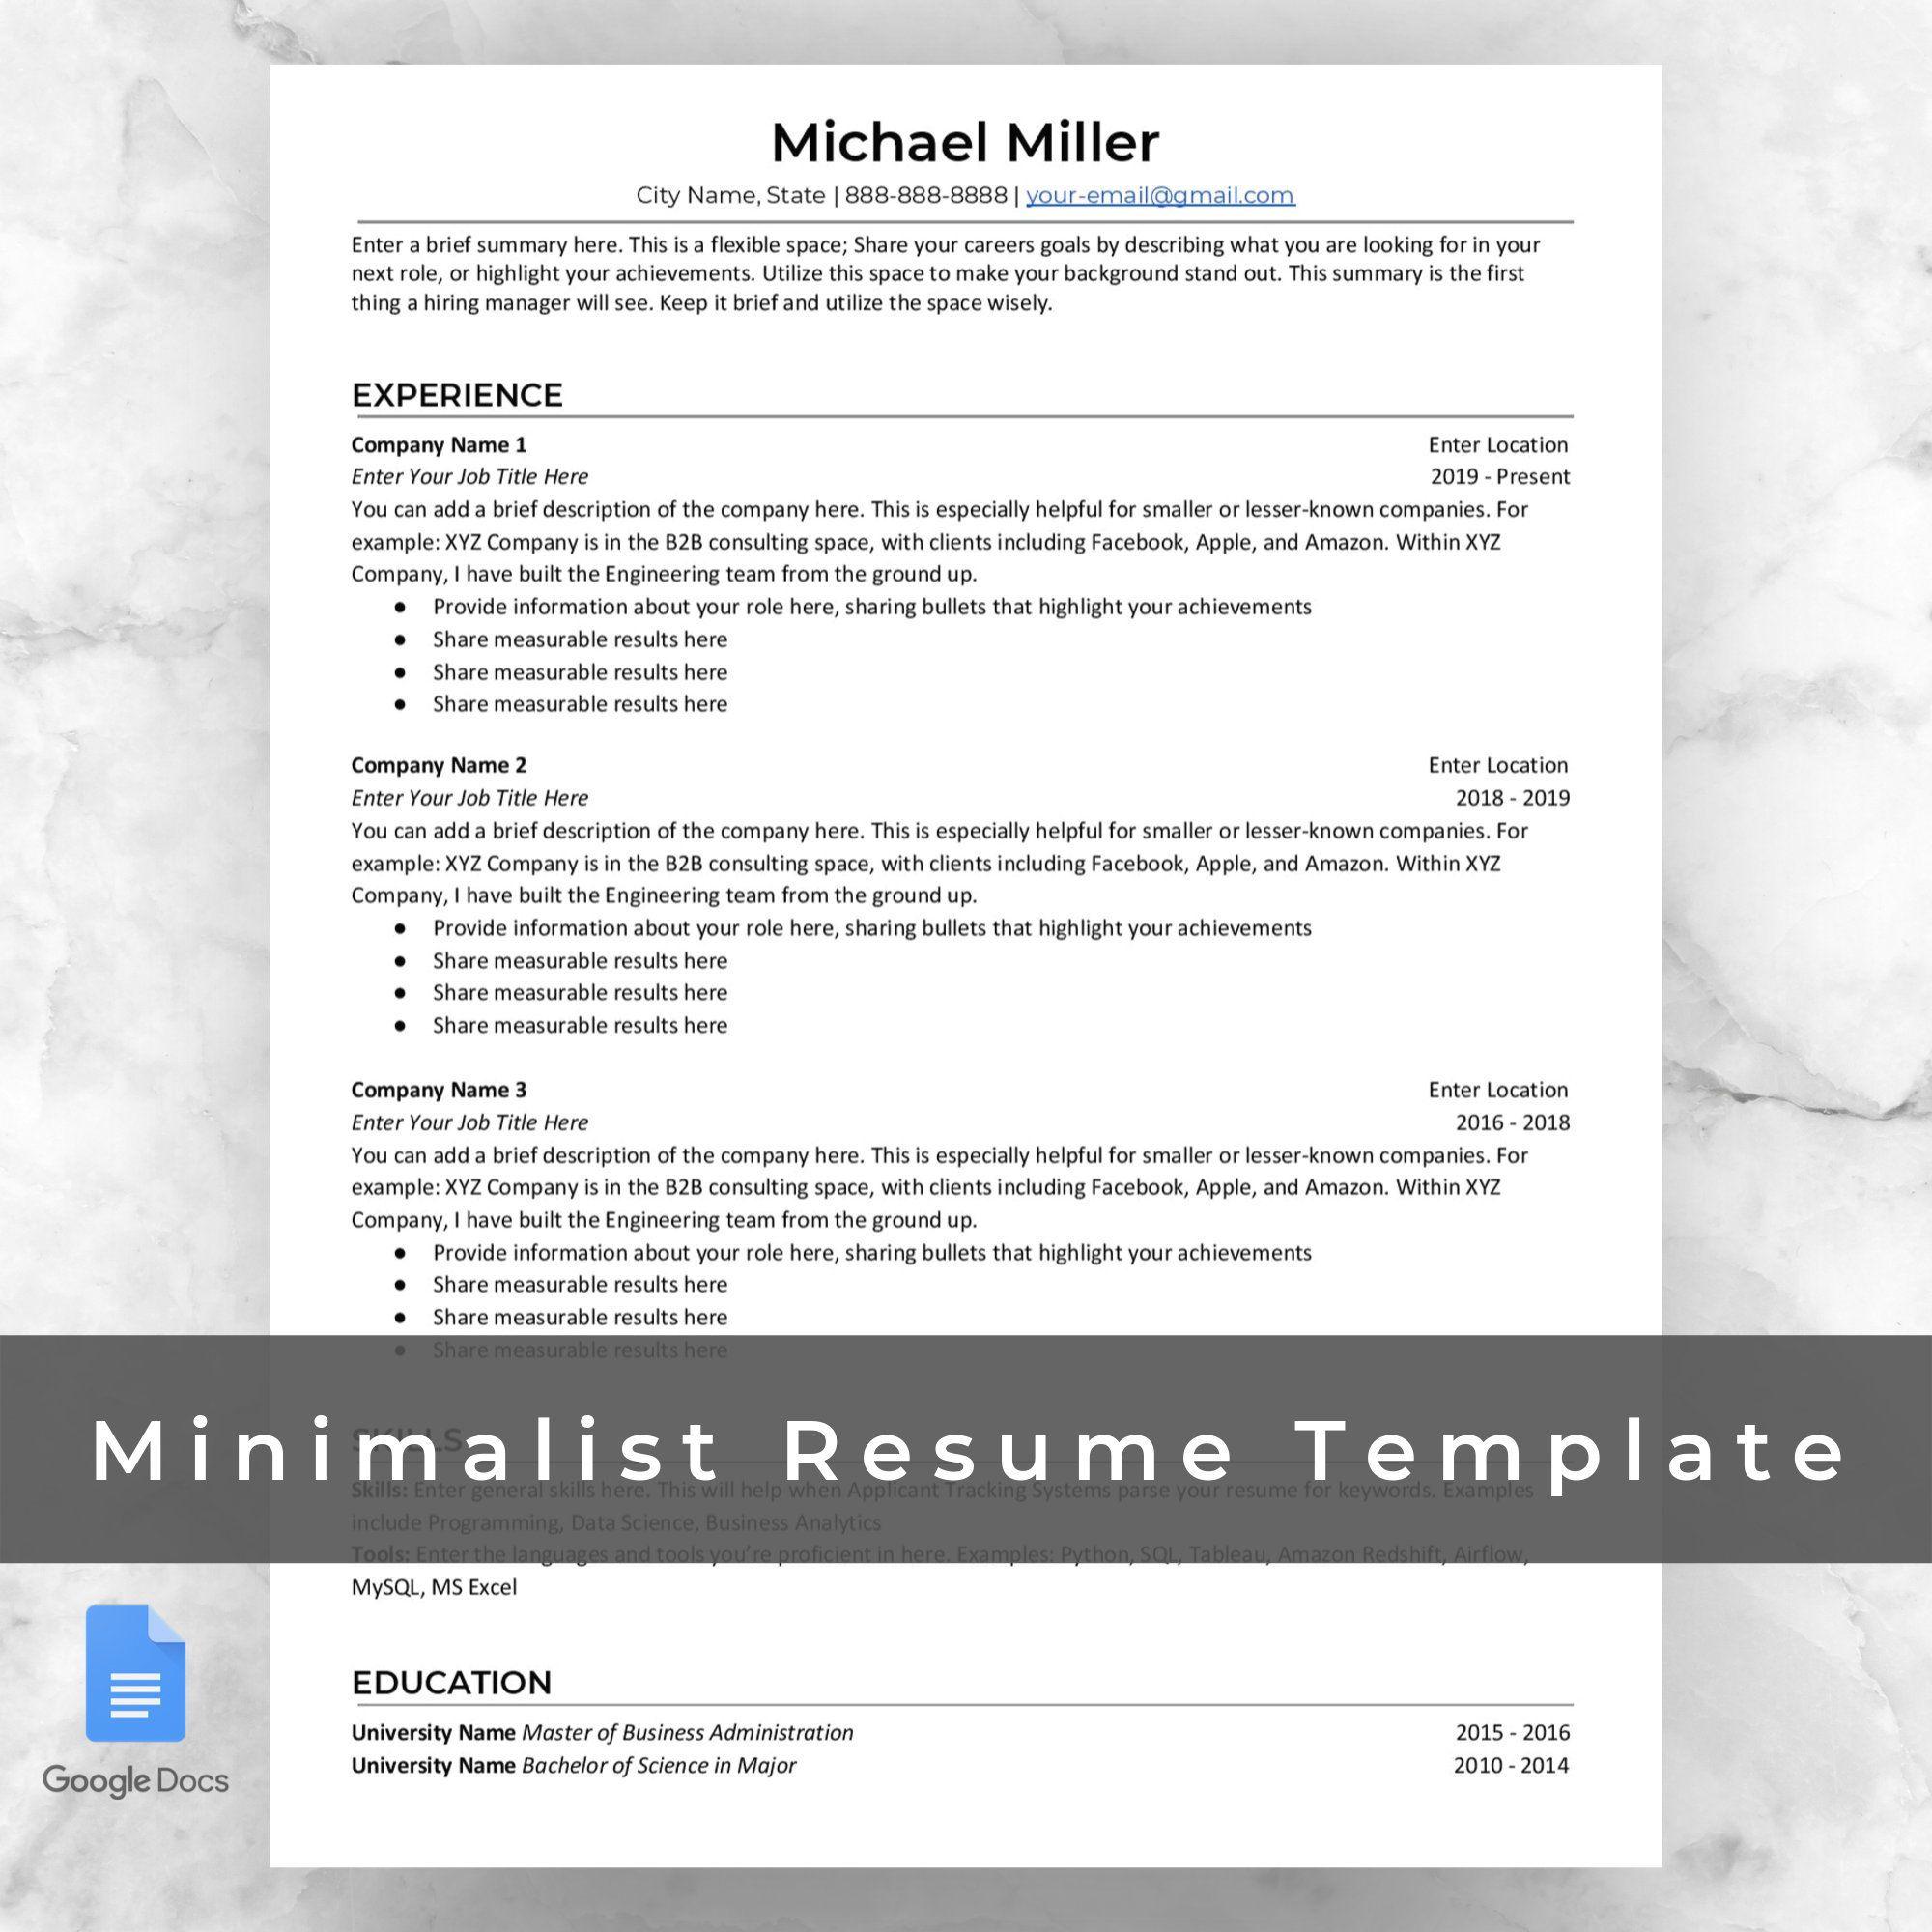 Professional Resume Template Google Docs / Functional